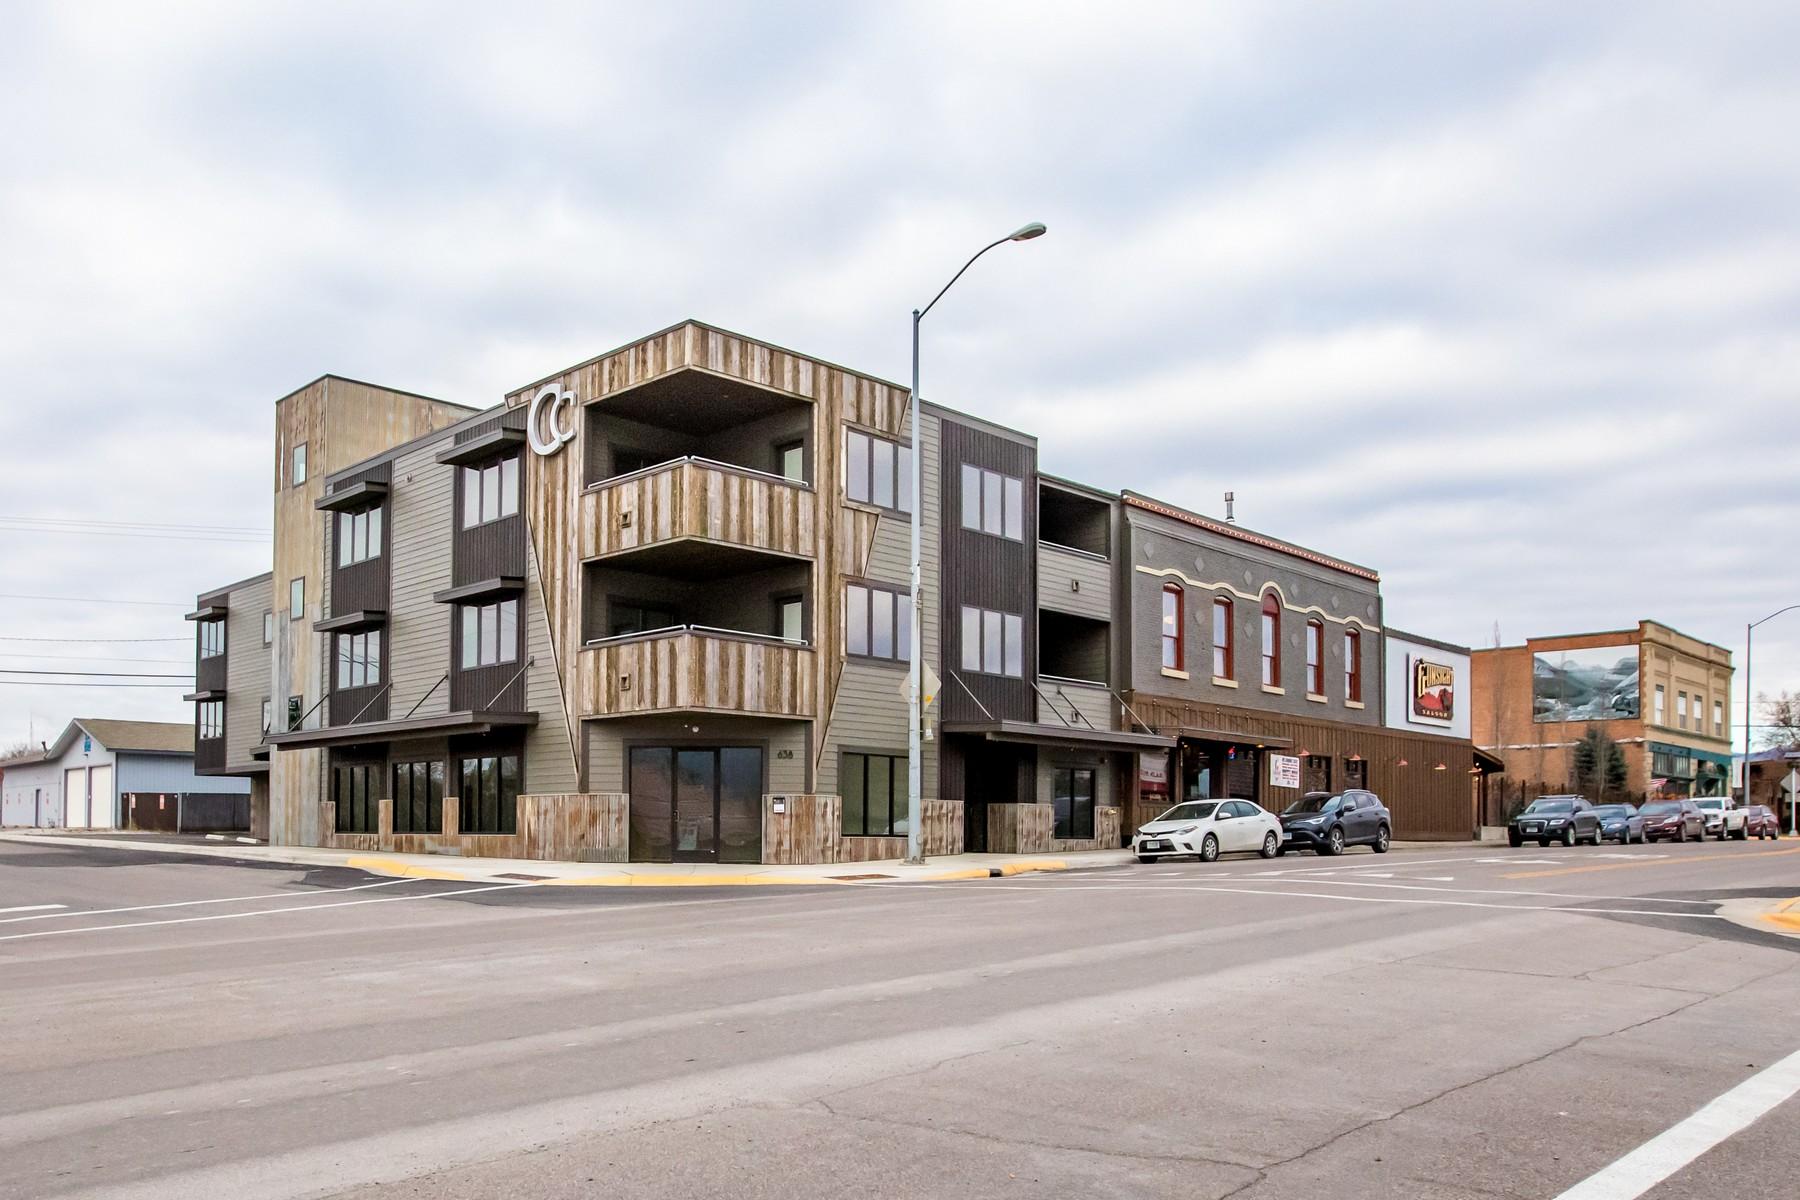 Condominiums 为 销售 在 638 Nucleus Avenue , #304 哥伦比亚瀑布, 蒙大拿州 59912 美国